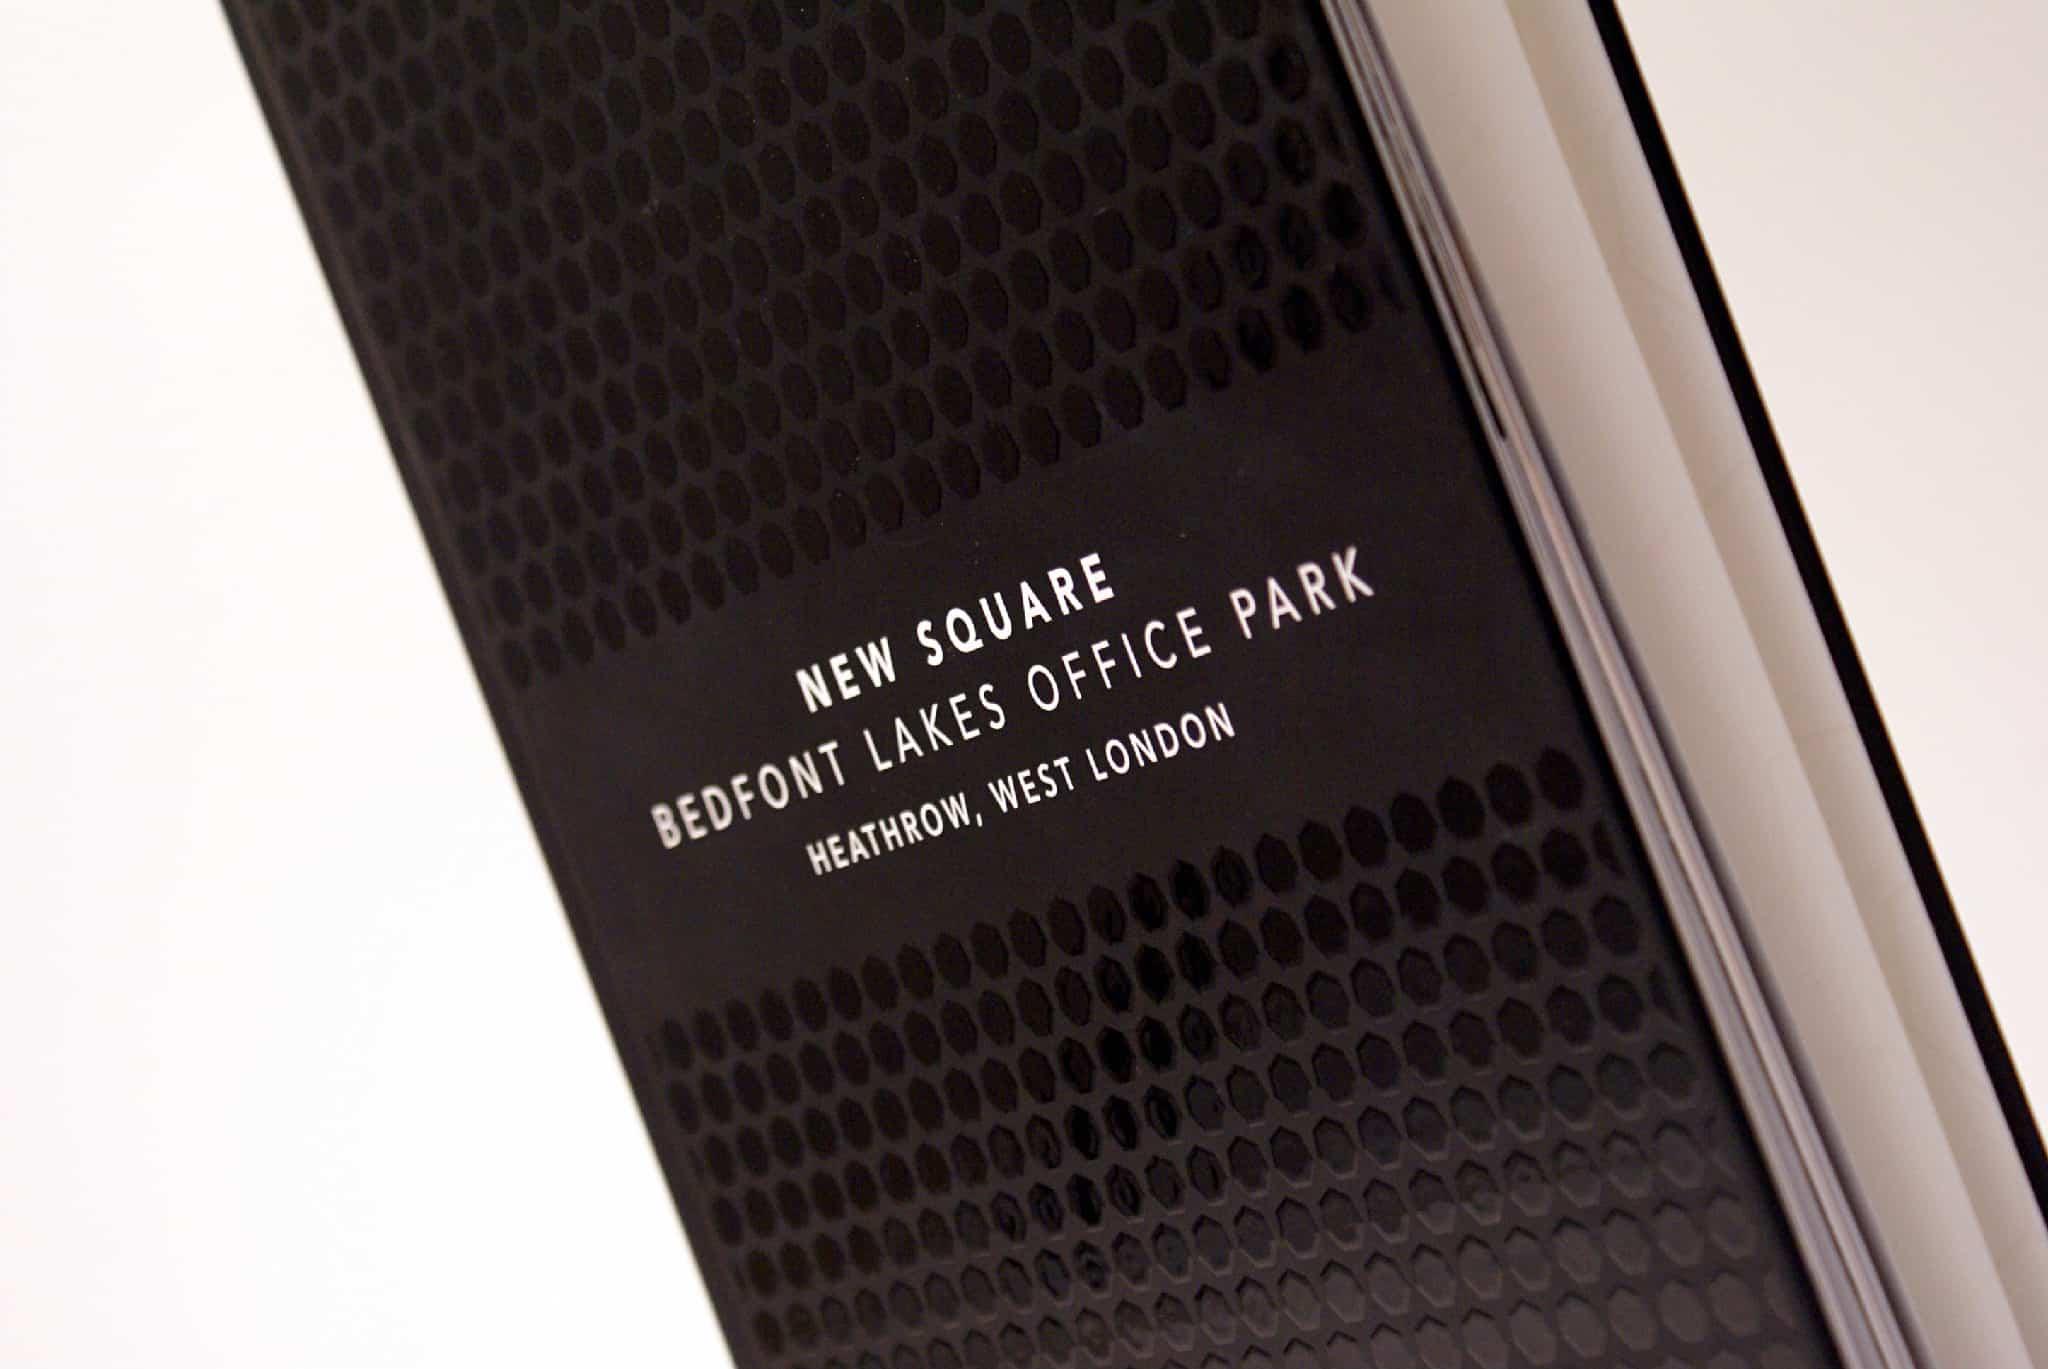 New Square – Bedfont Lakes Office Park